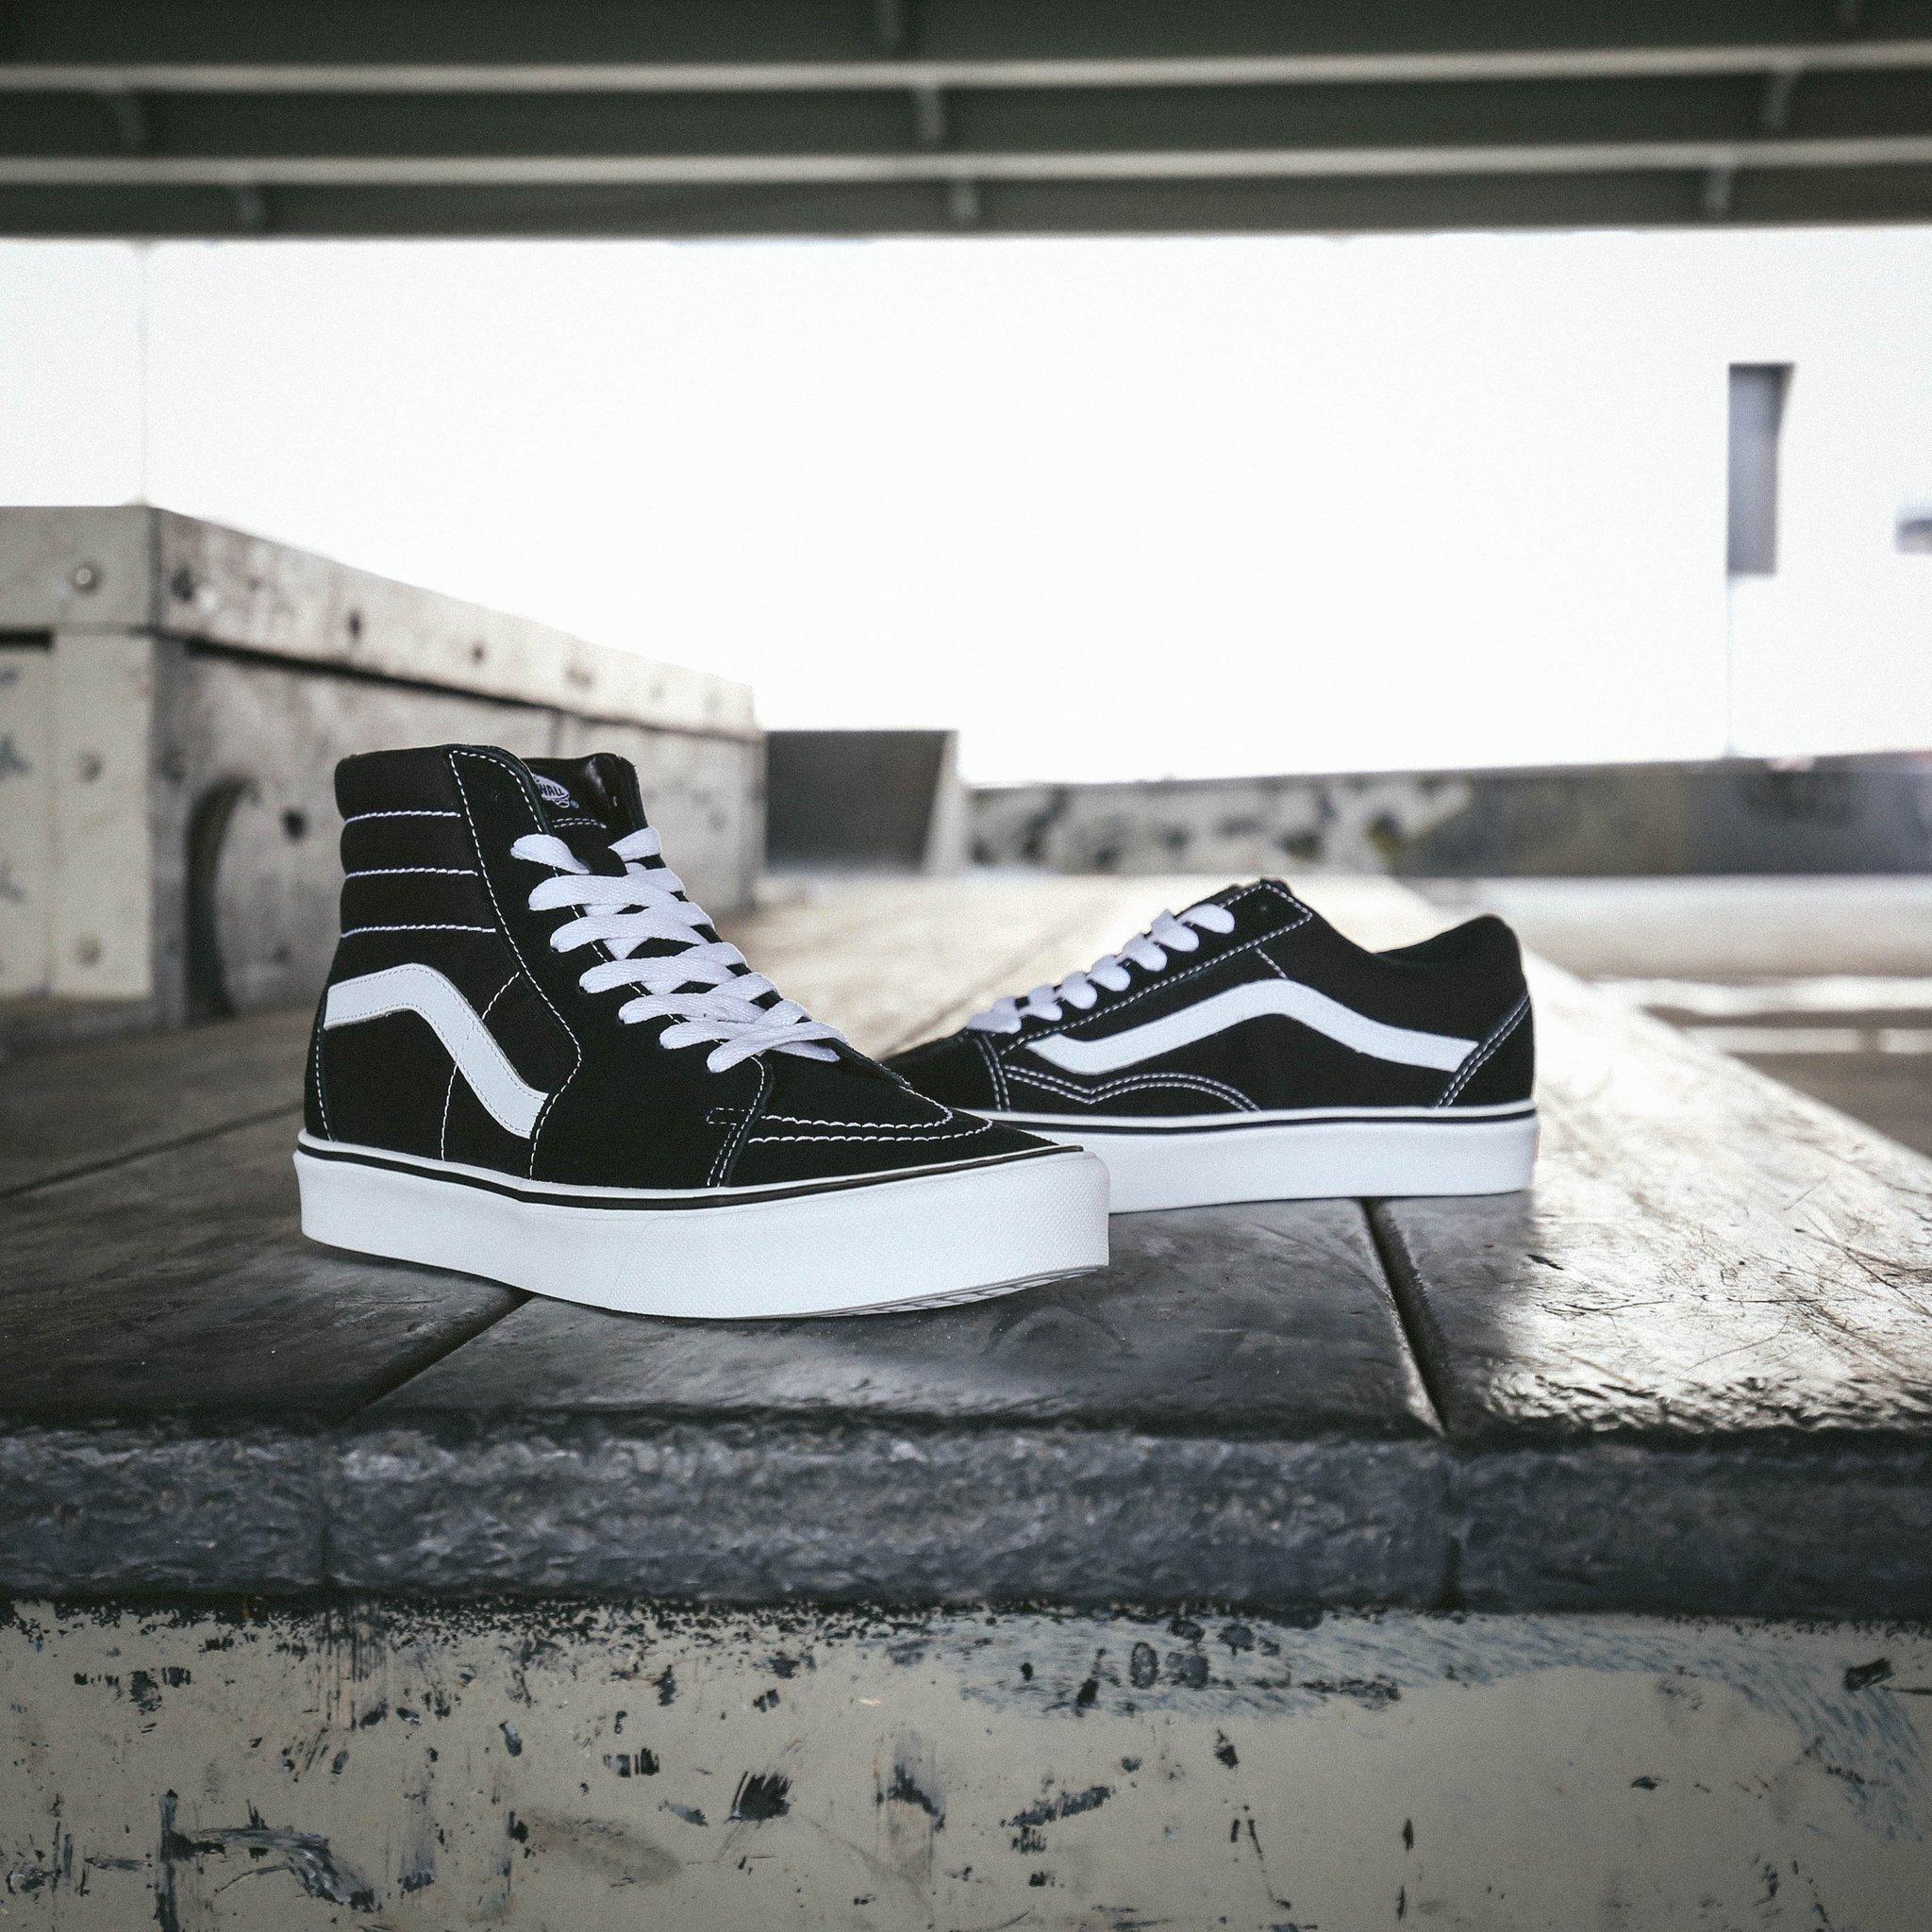 footlocker vans